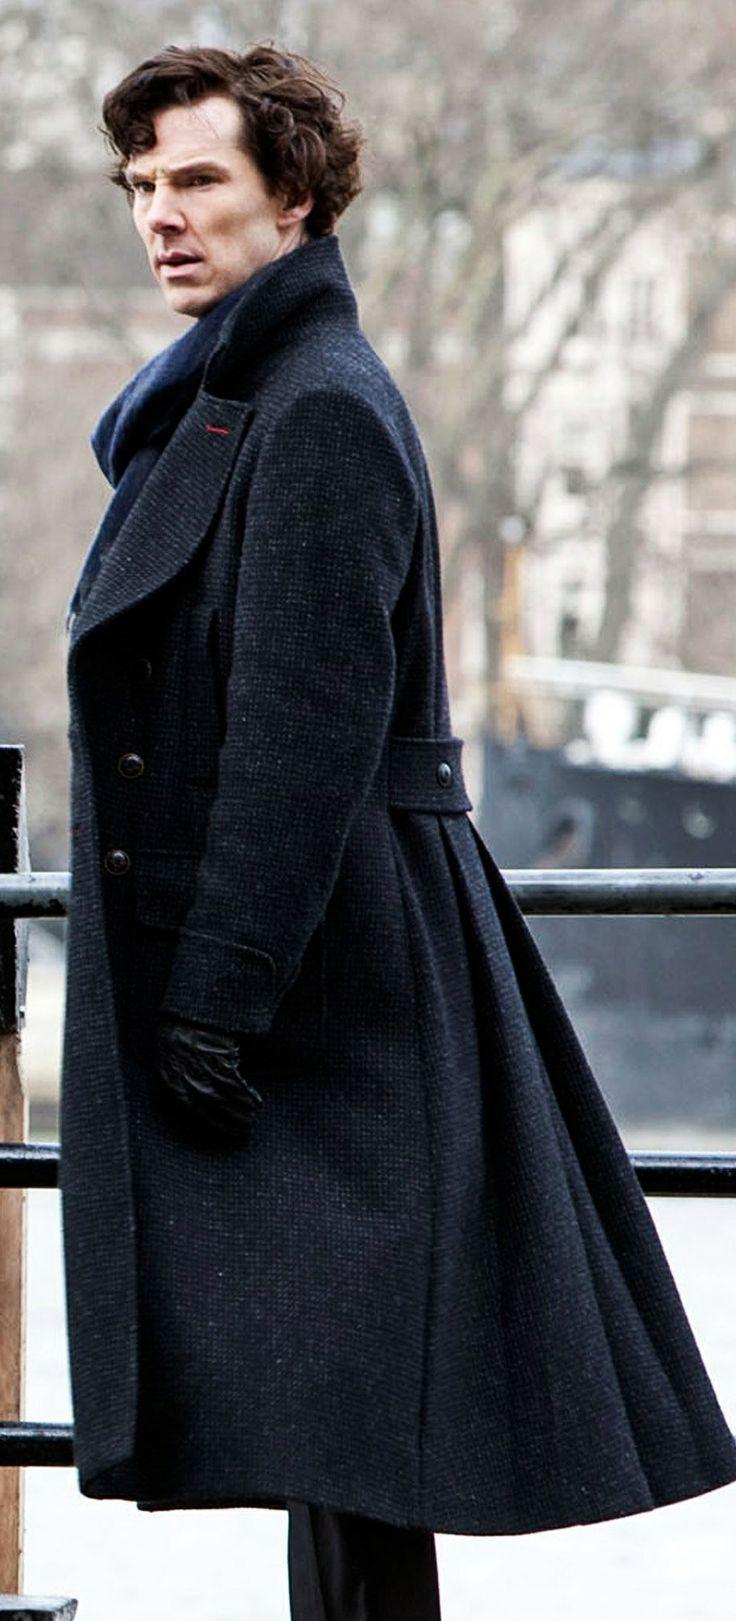 Sherlock's Coat http://cosplaysky.com/sherlock-holmes-cape-coat-cosplay-costume-wool-version.html